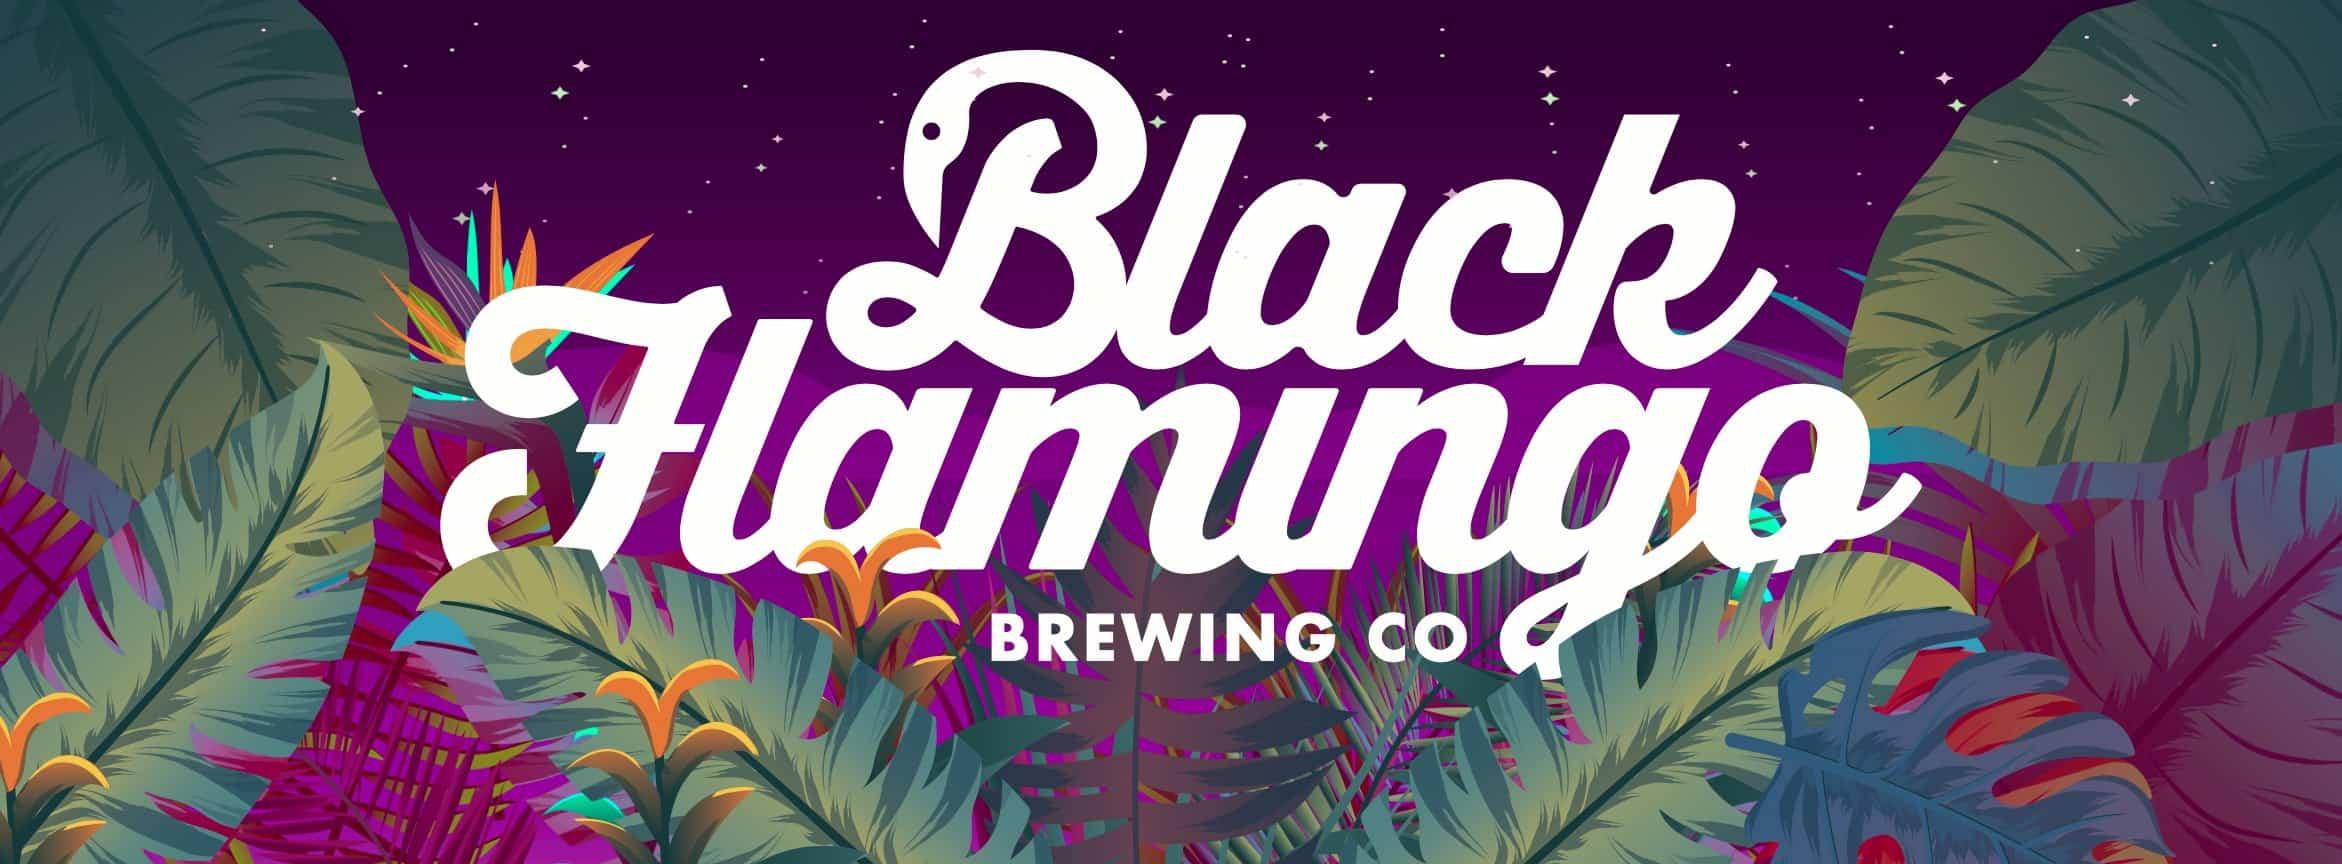 Black Flamingo Brewing Co (coming soon)